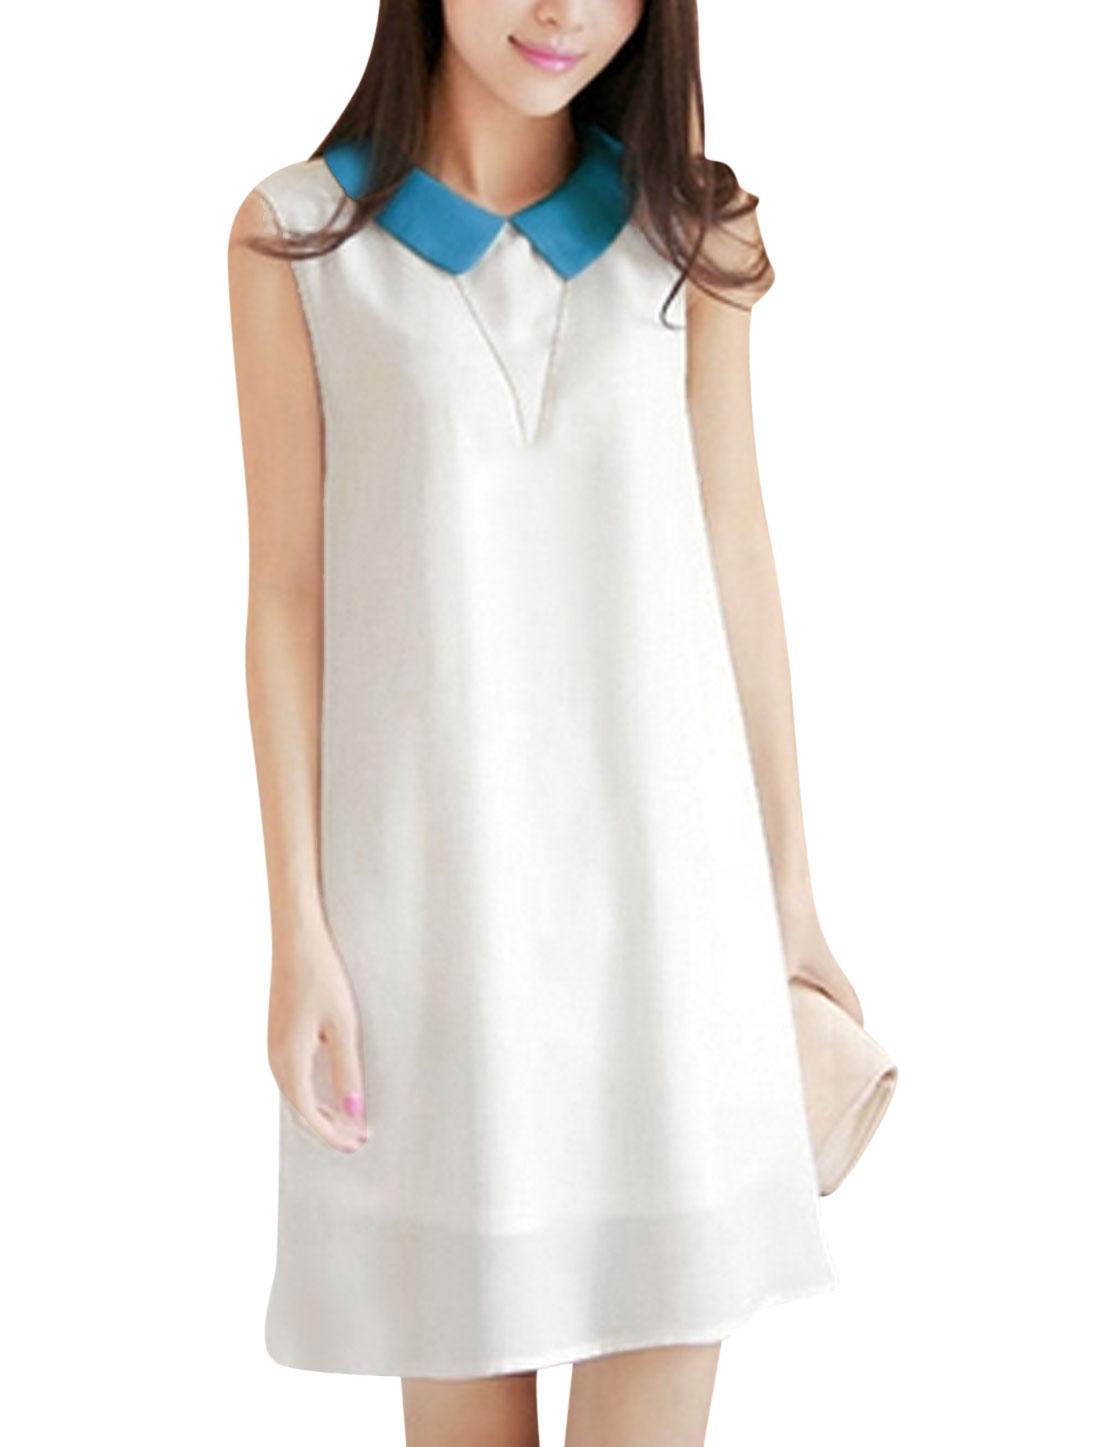 Lady Doll Collar Chiffon Blouson Dress w Waist Belt White Sea Blue XS